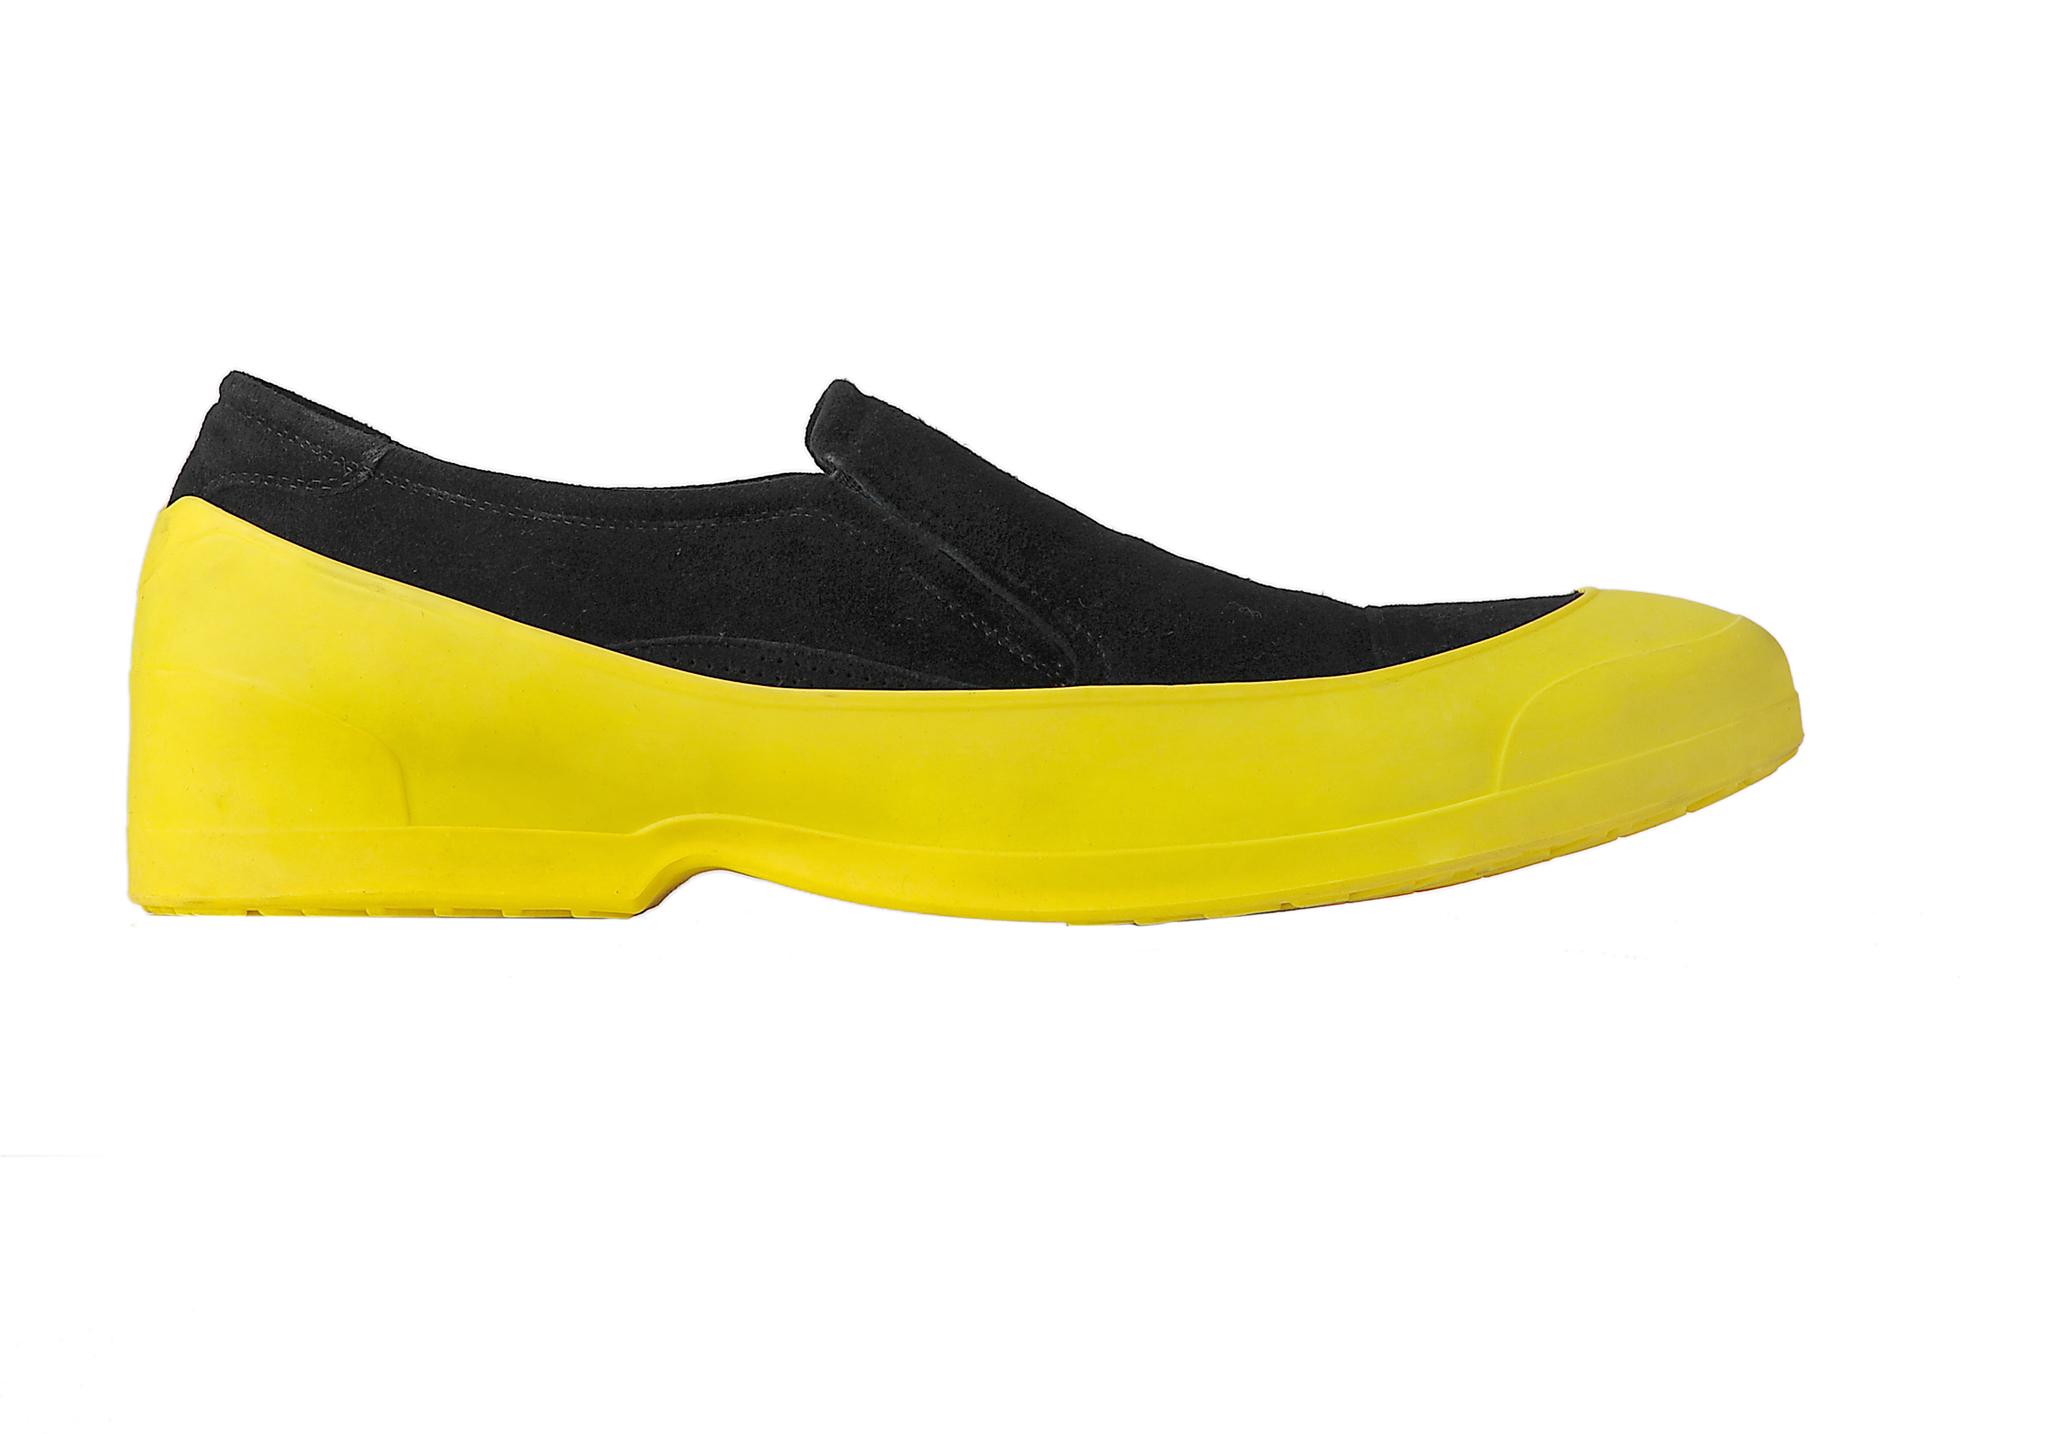 Галоши * Мужские галоши открытого типа цвет желтый DSC_0007.jpg